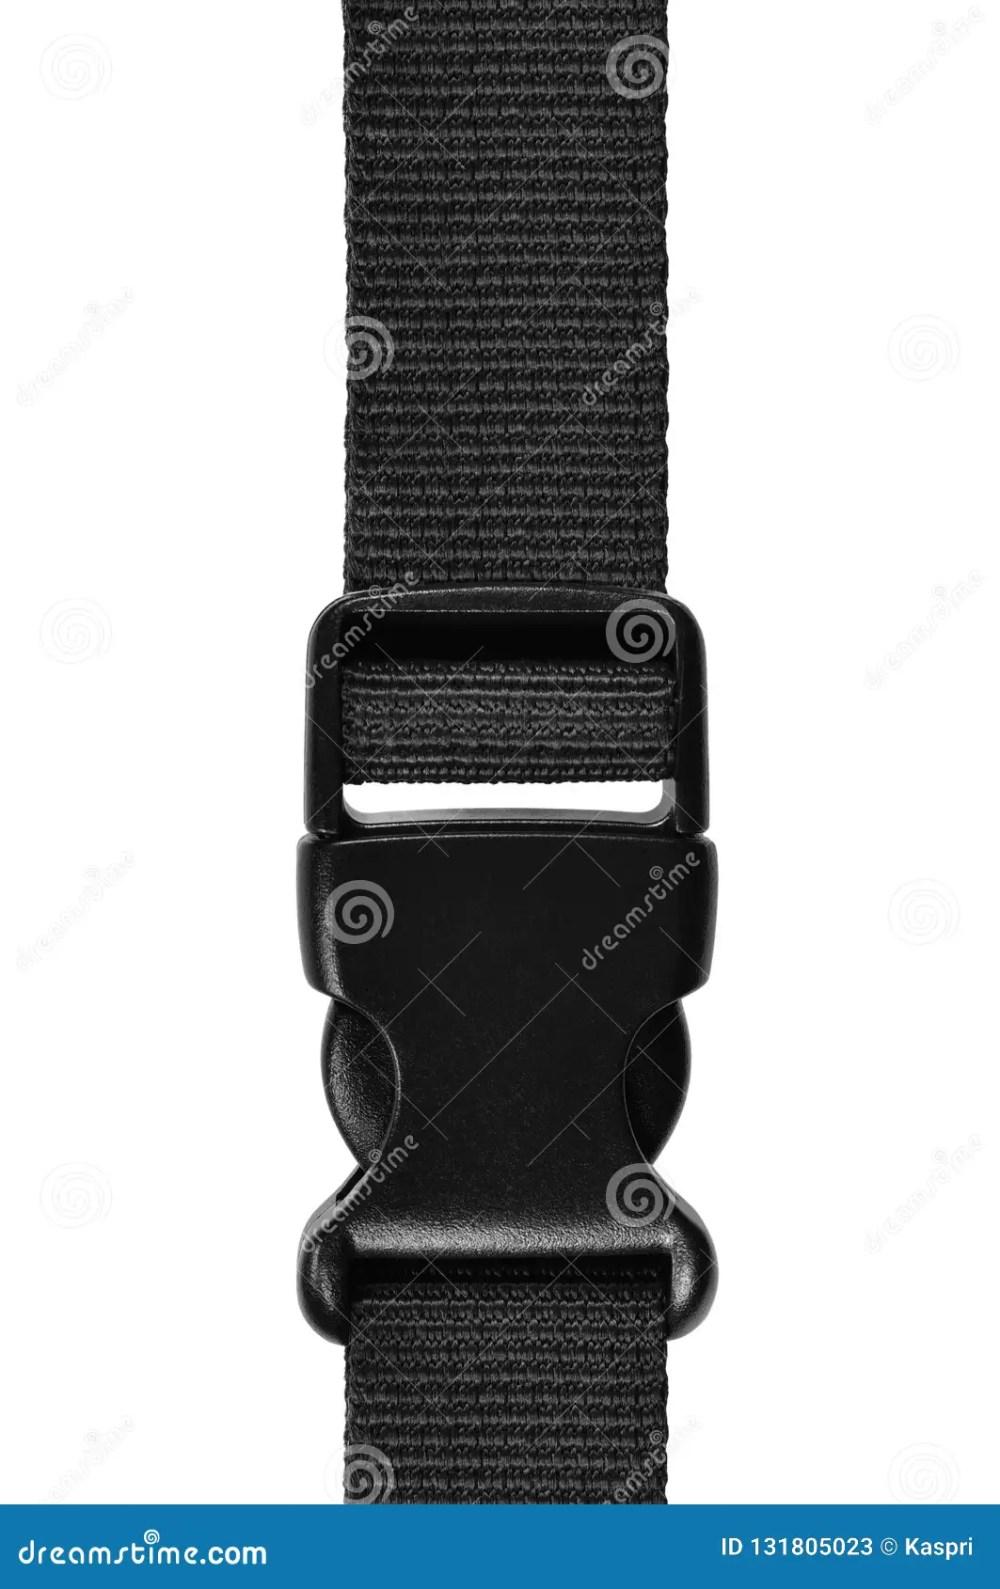 medium resolution of black side release acculoc buckle plastic clasp quick nylon belt rope lock strap isolated